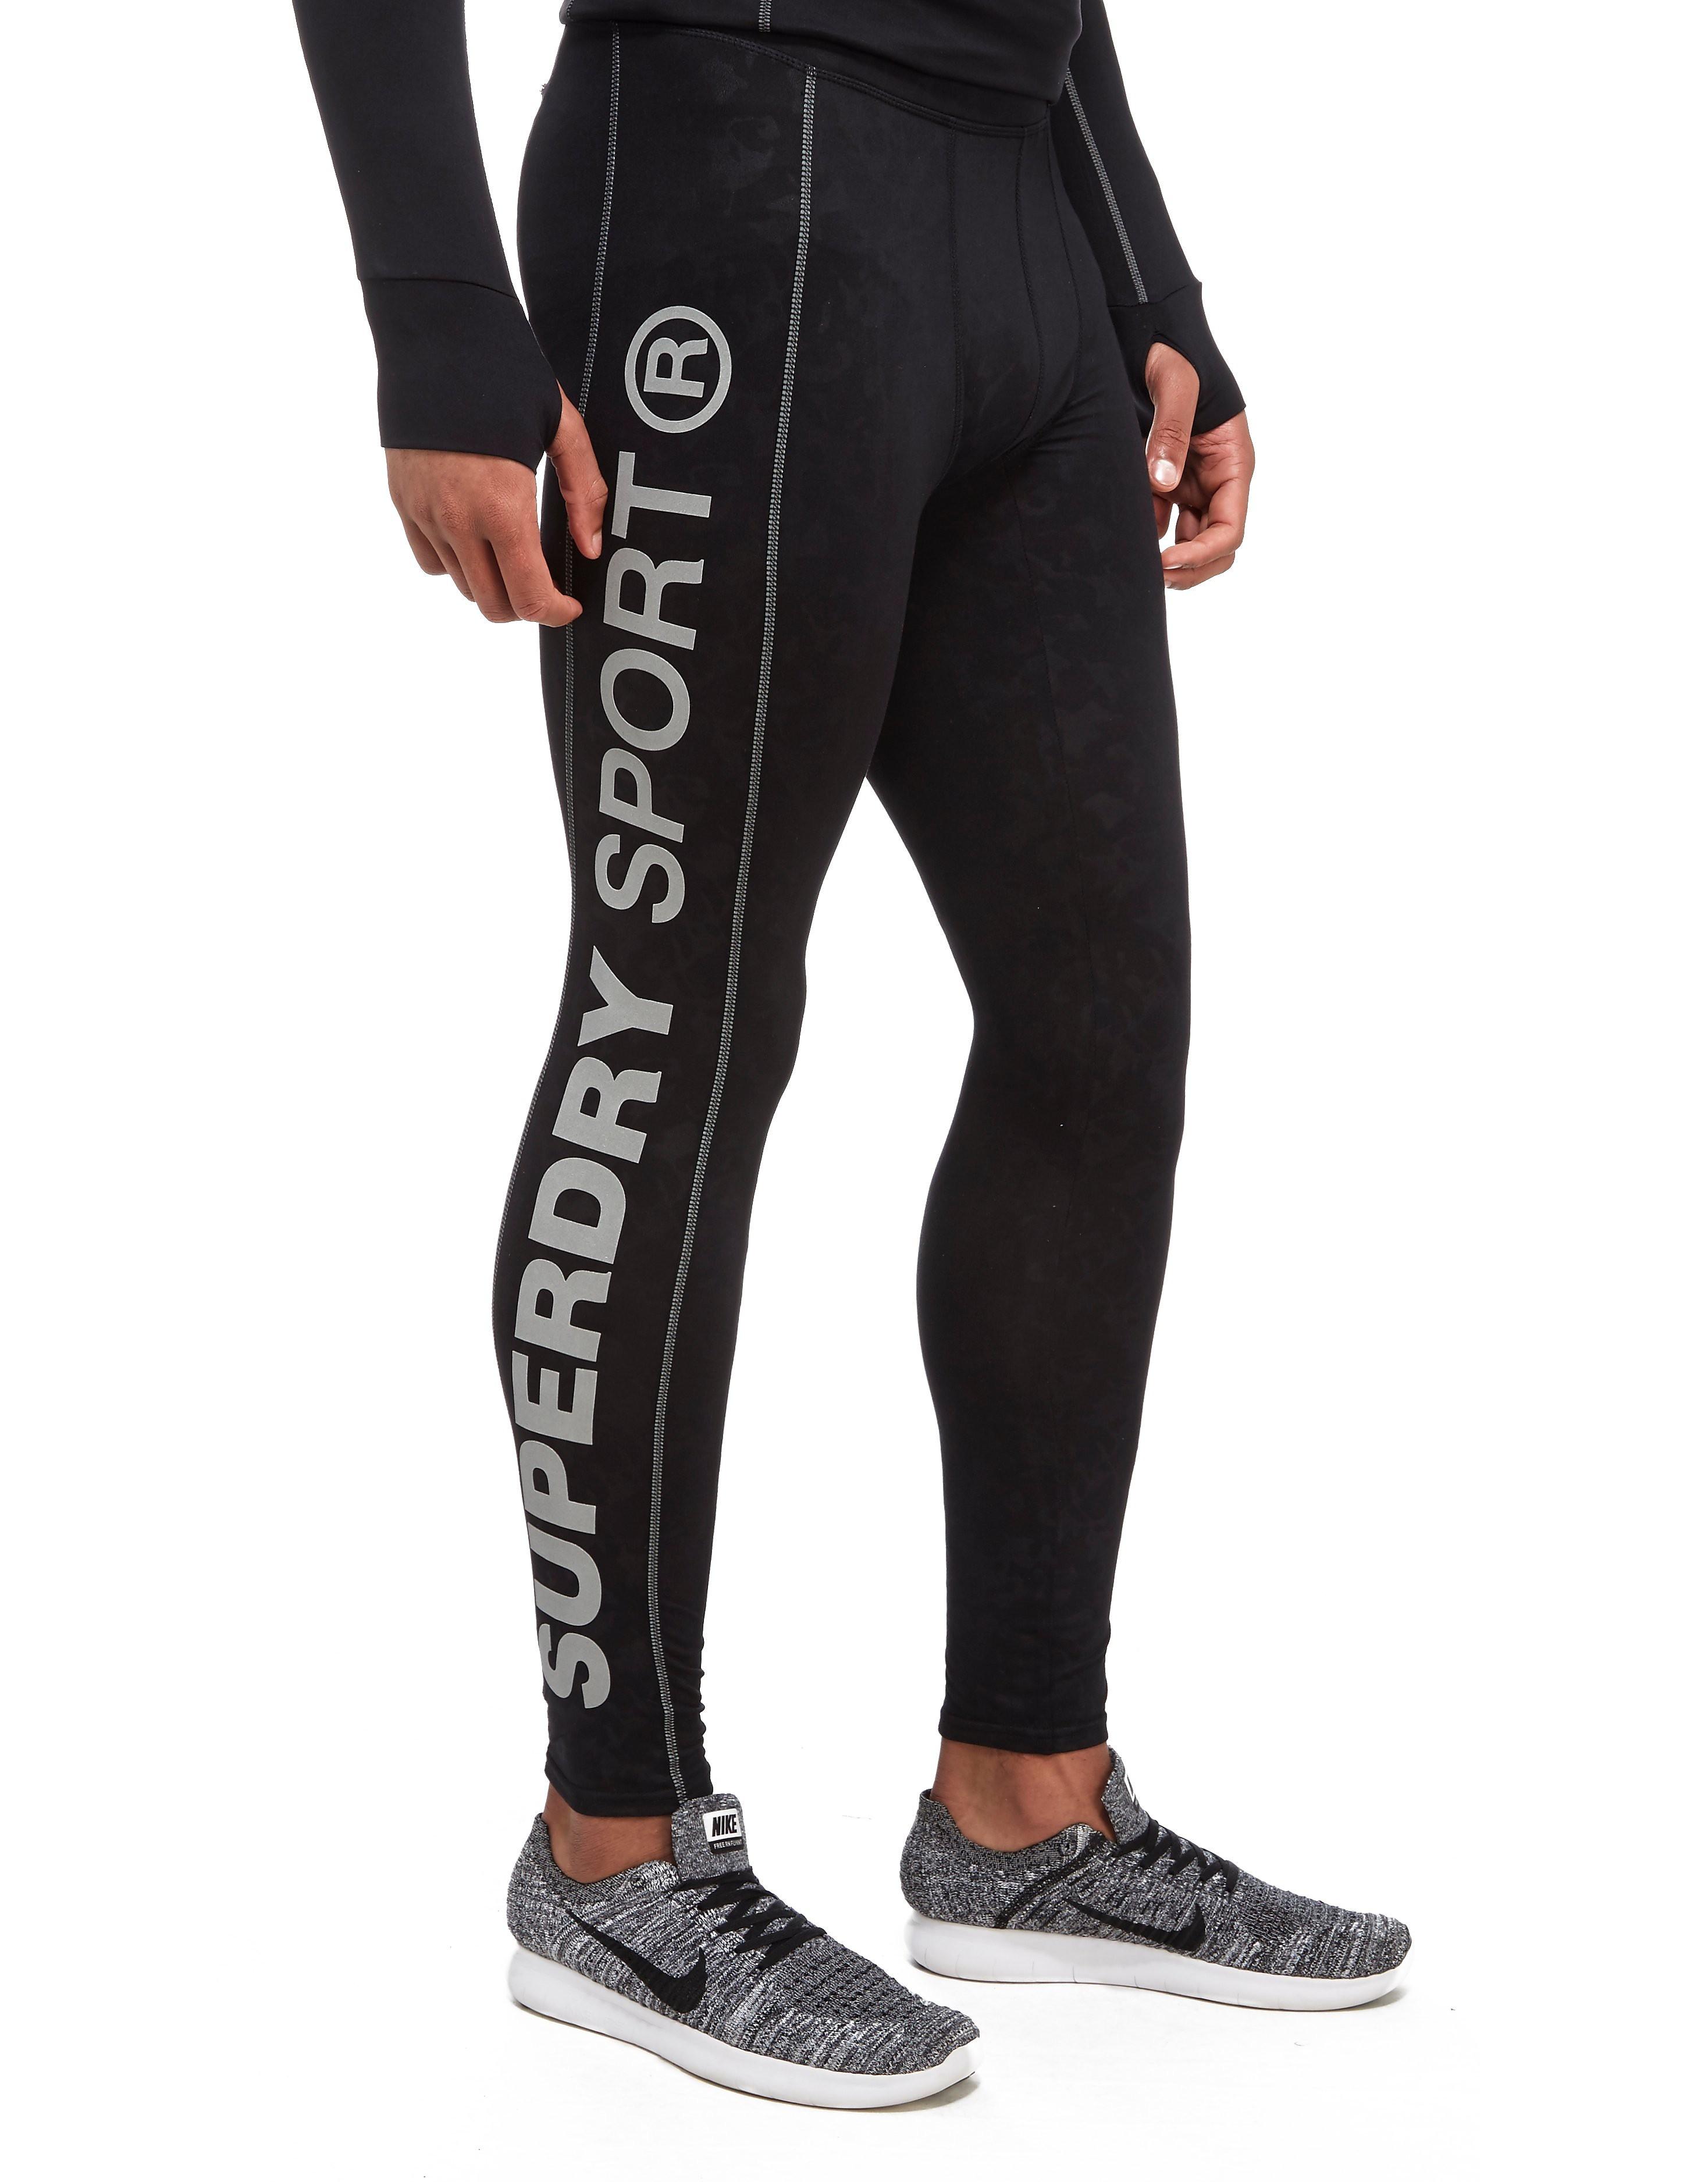 Superdry Gym Tech Slim Joggers